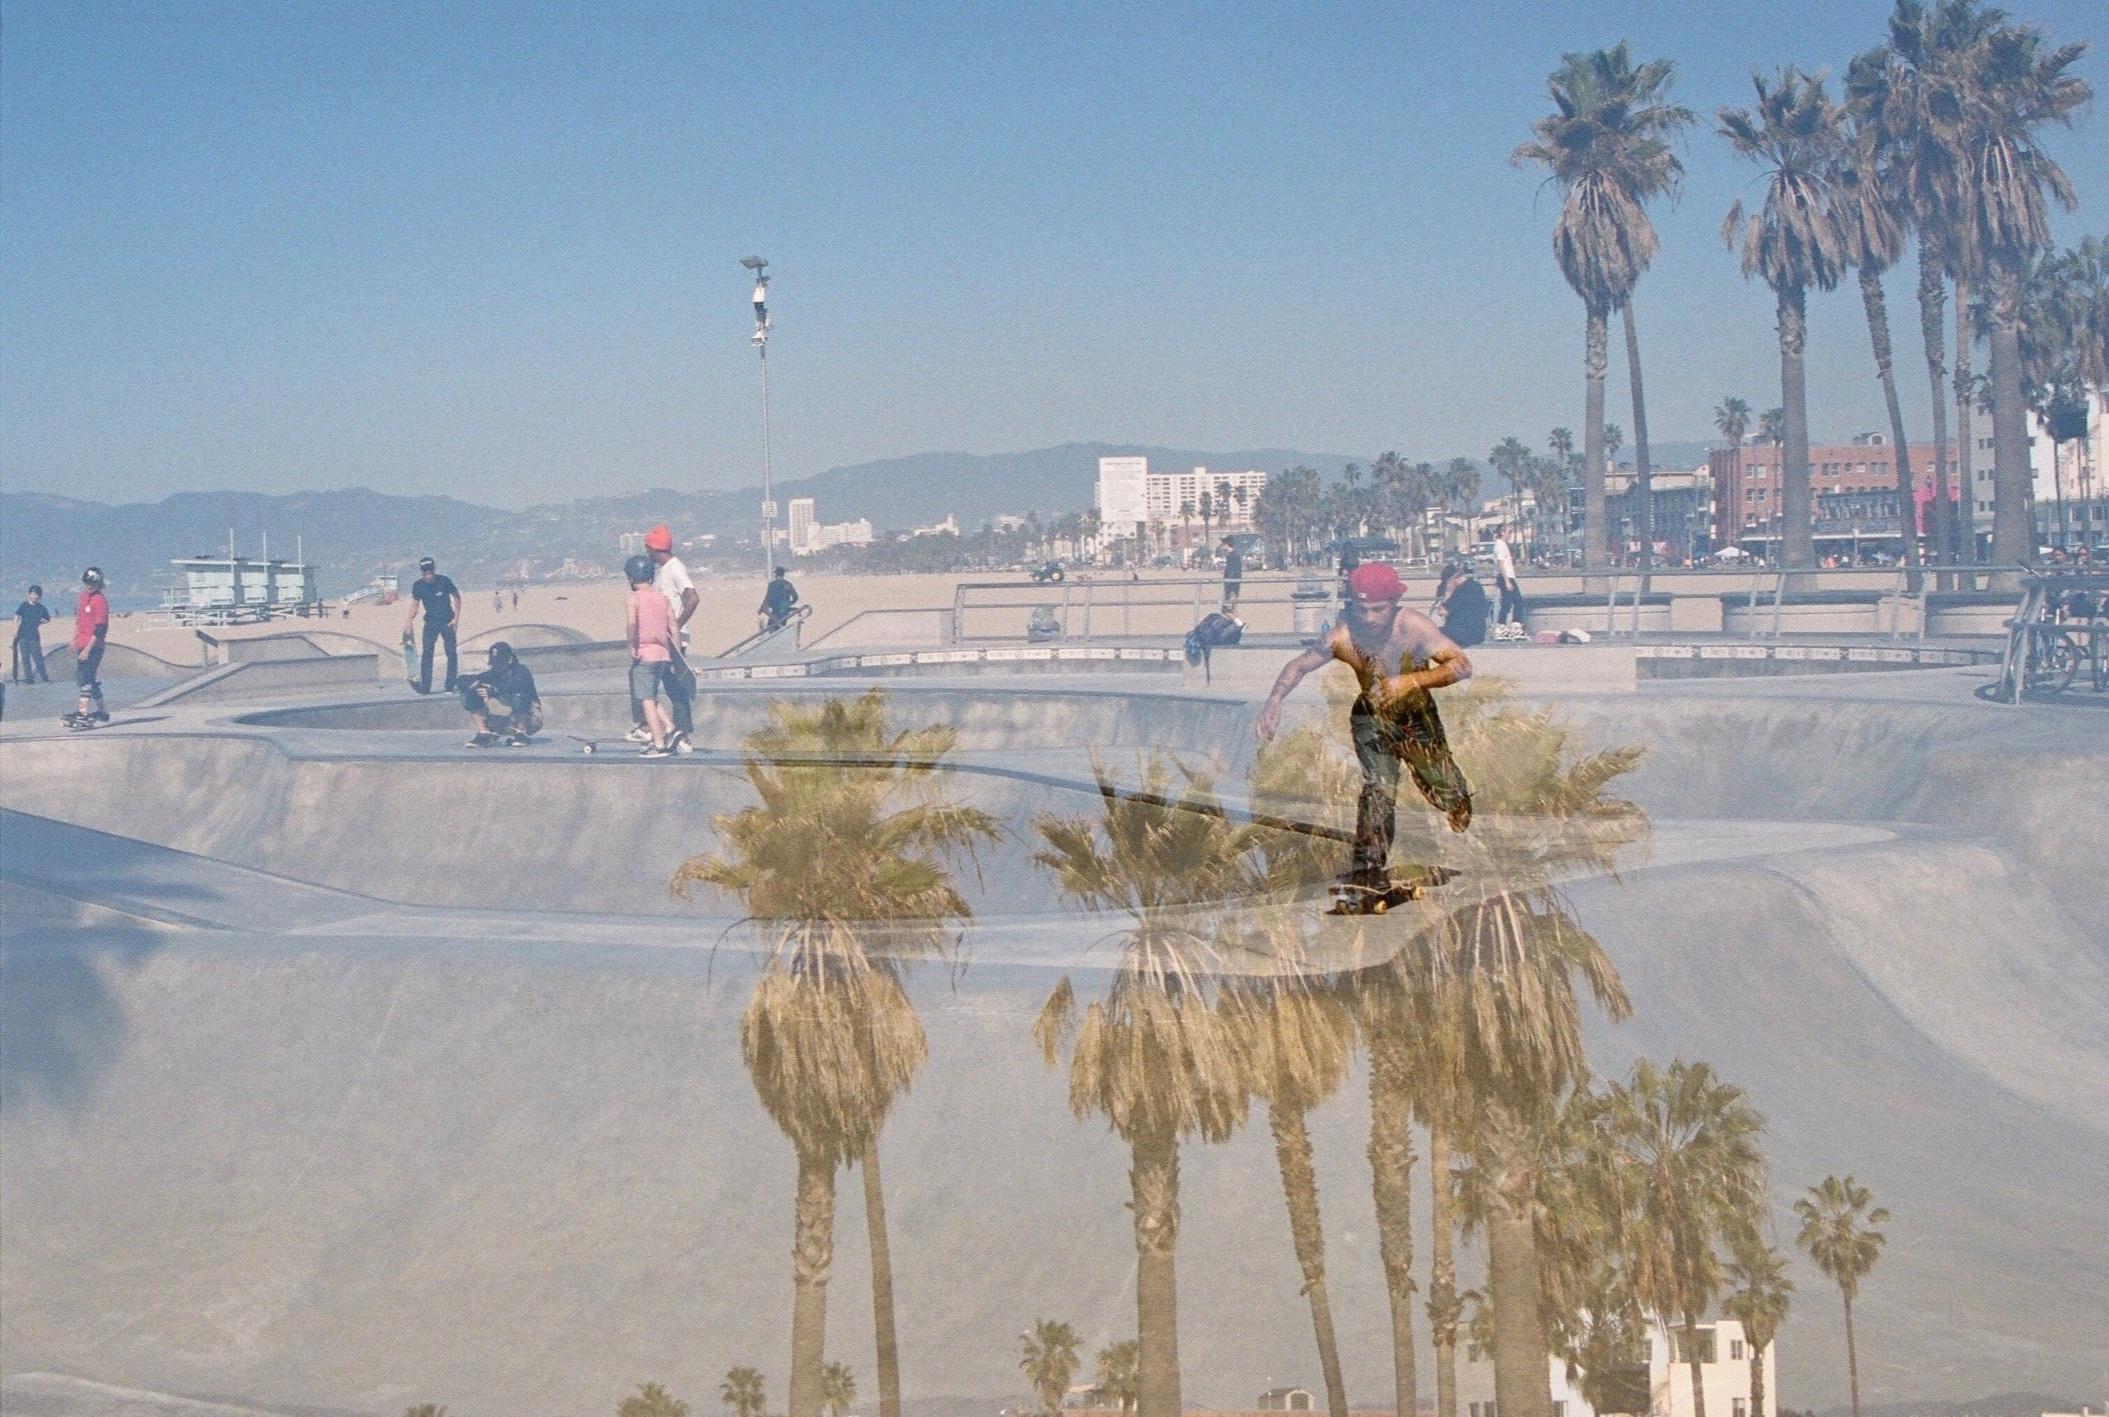 Palms & Skate